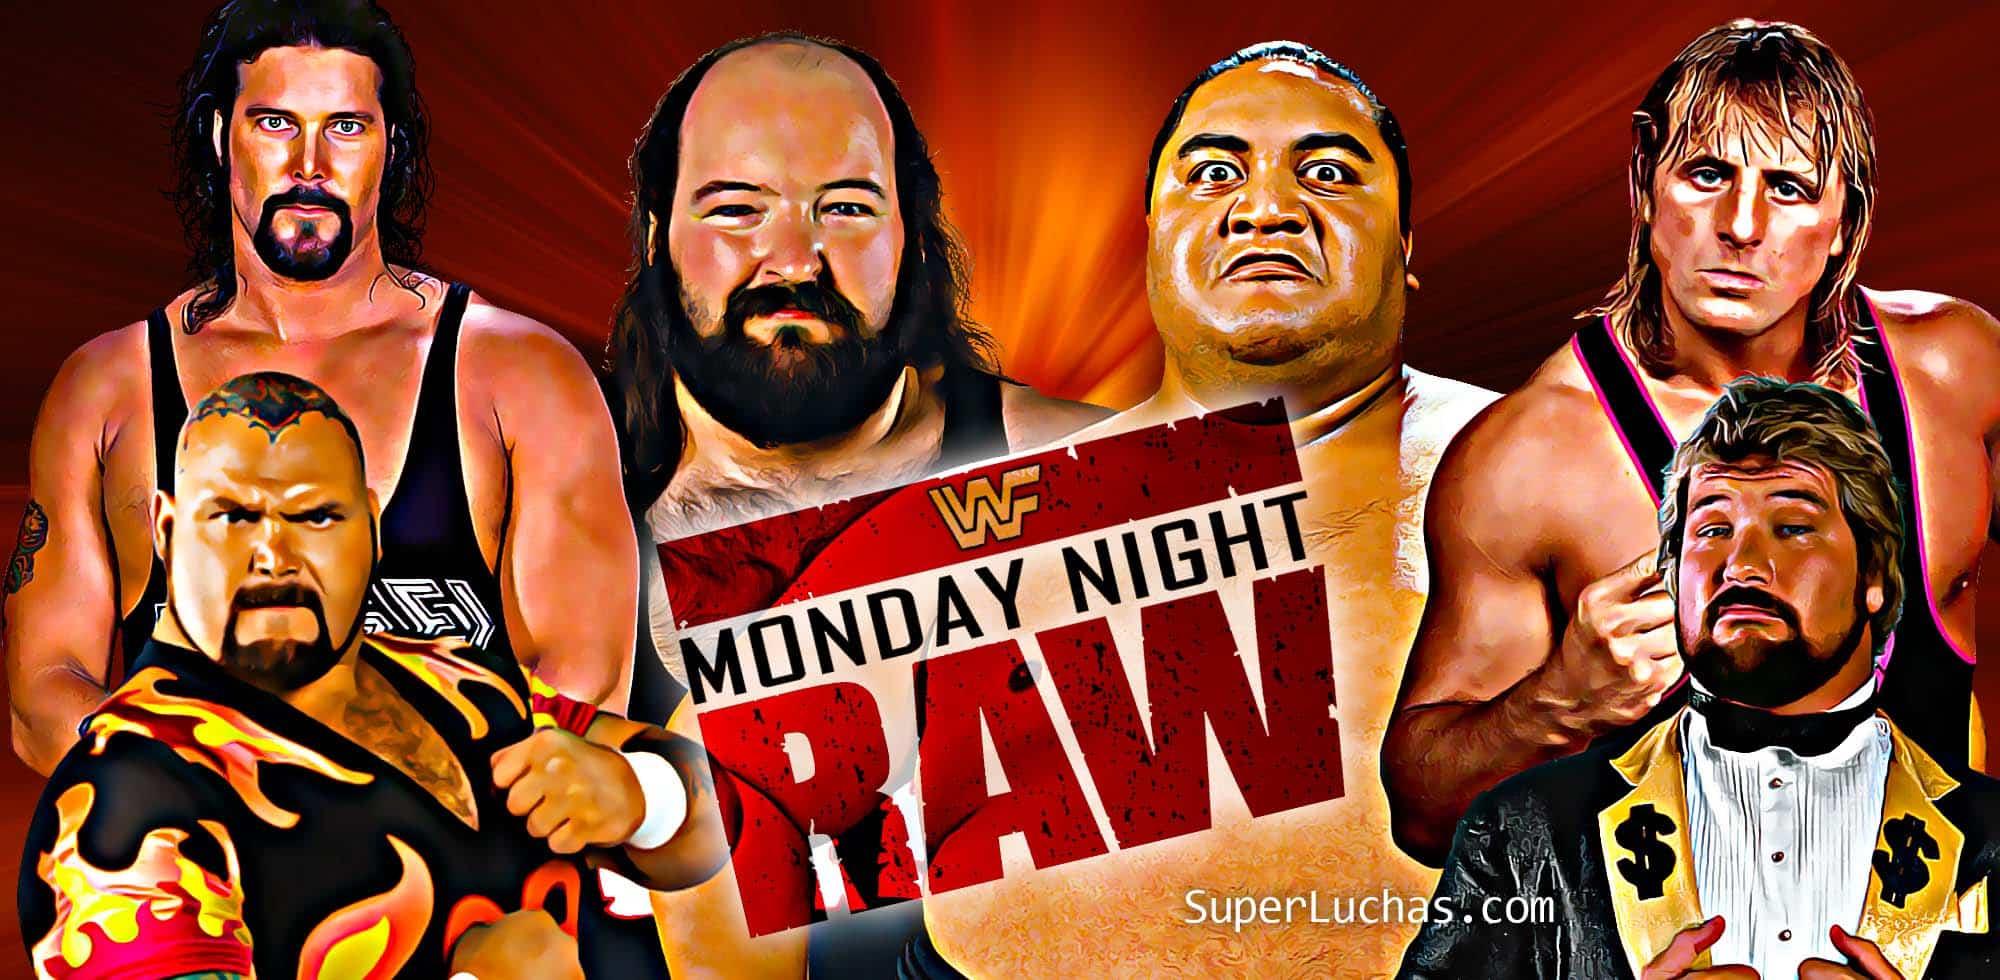 Monday Night Raw Clásico (16 mayo 1994) — Yokozuna vs. Earthquake en lucha sumo 1